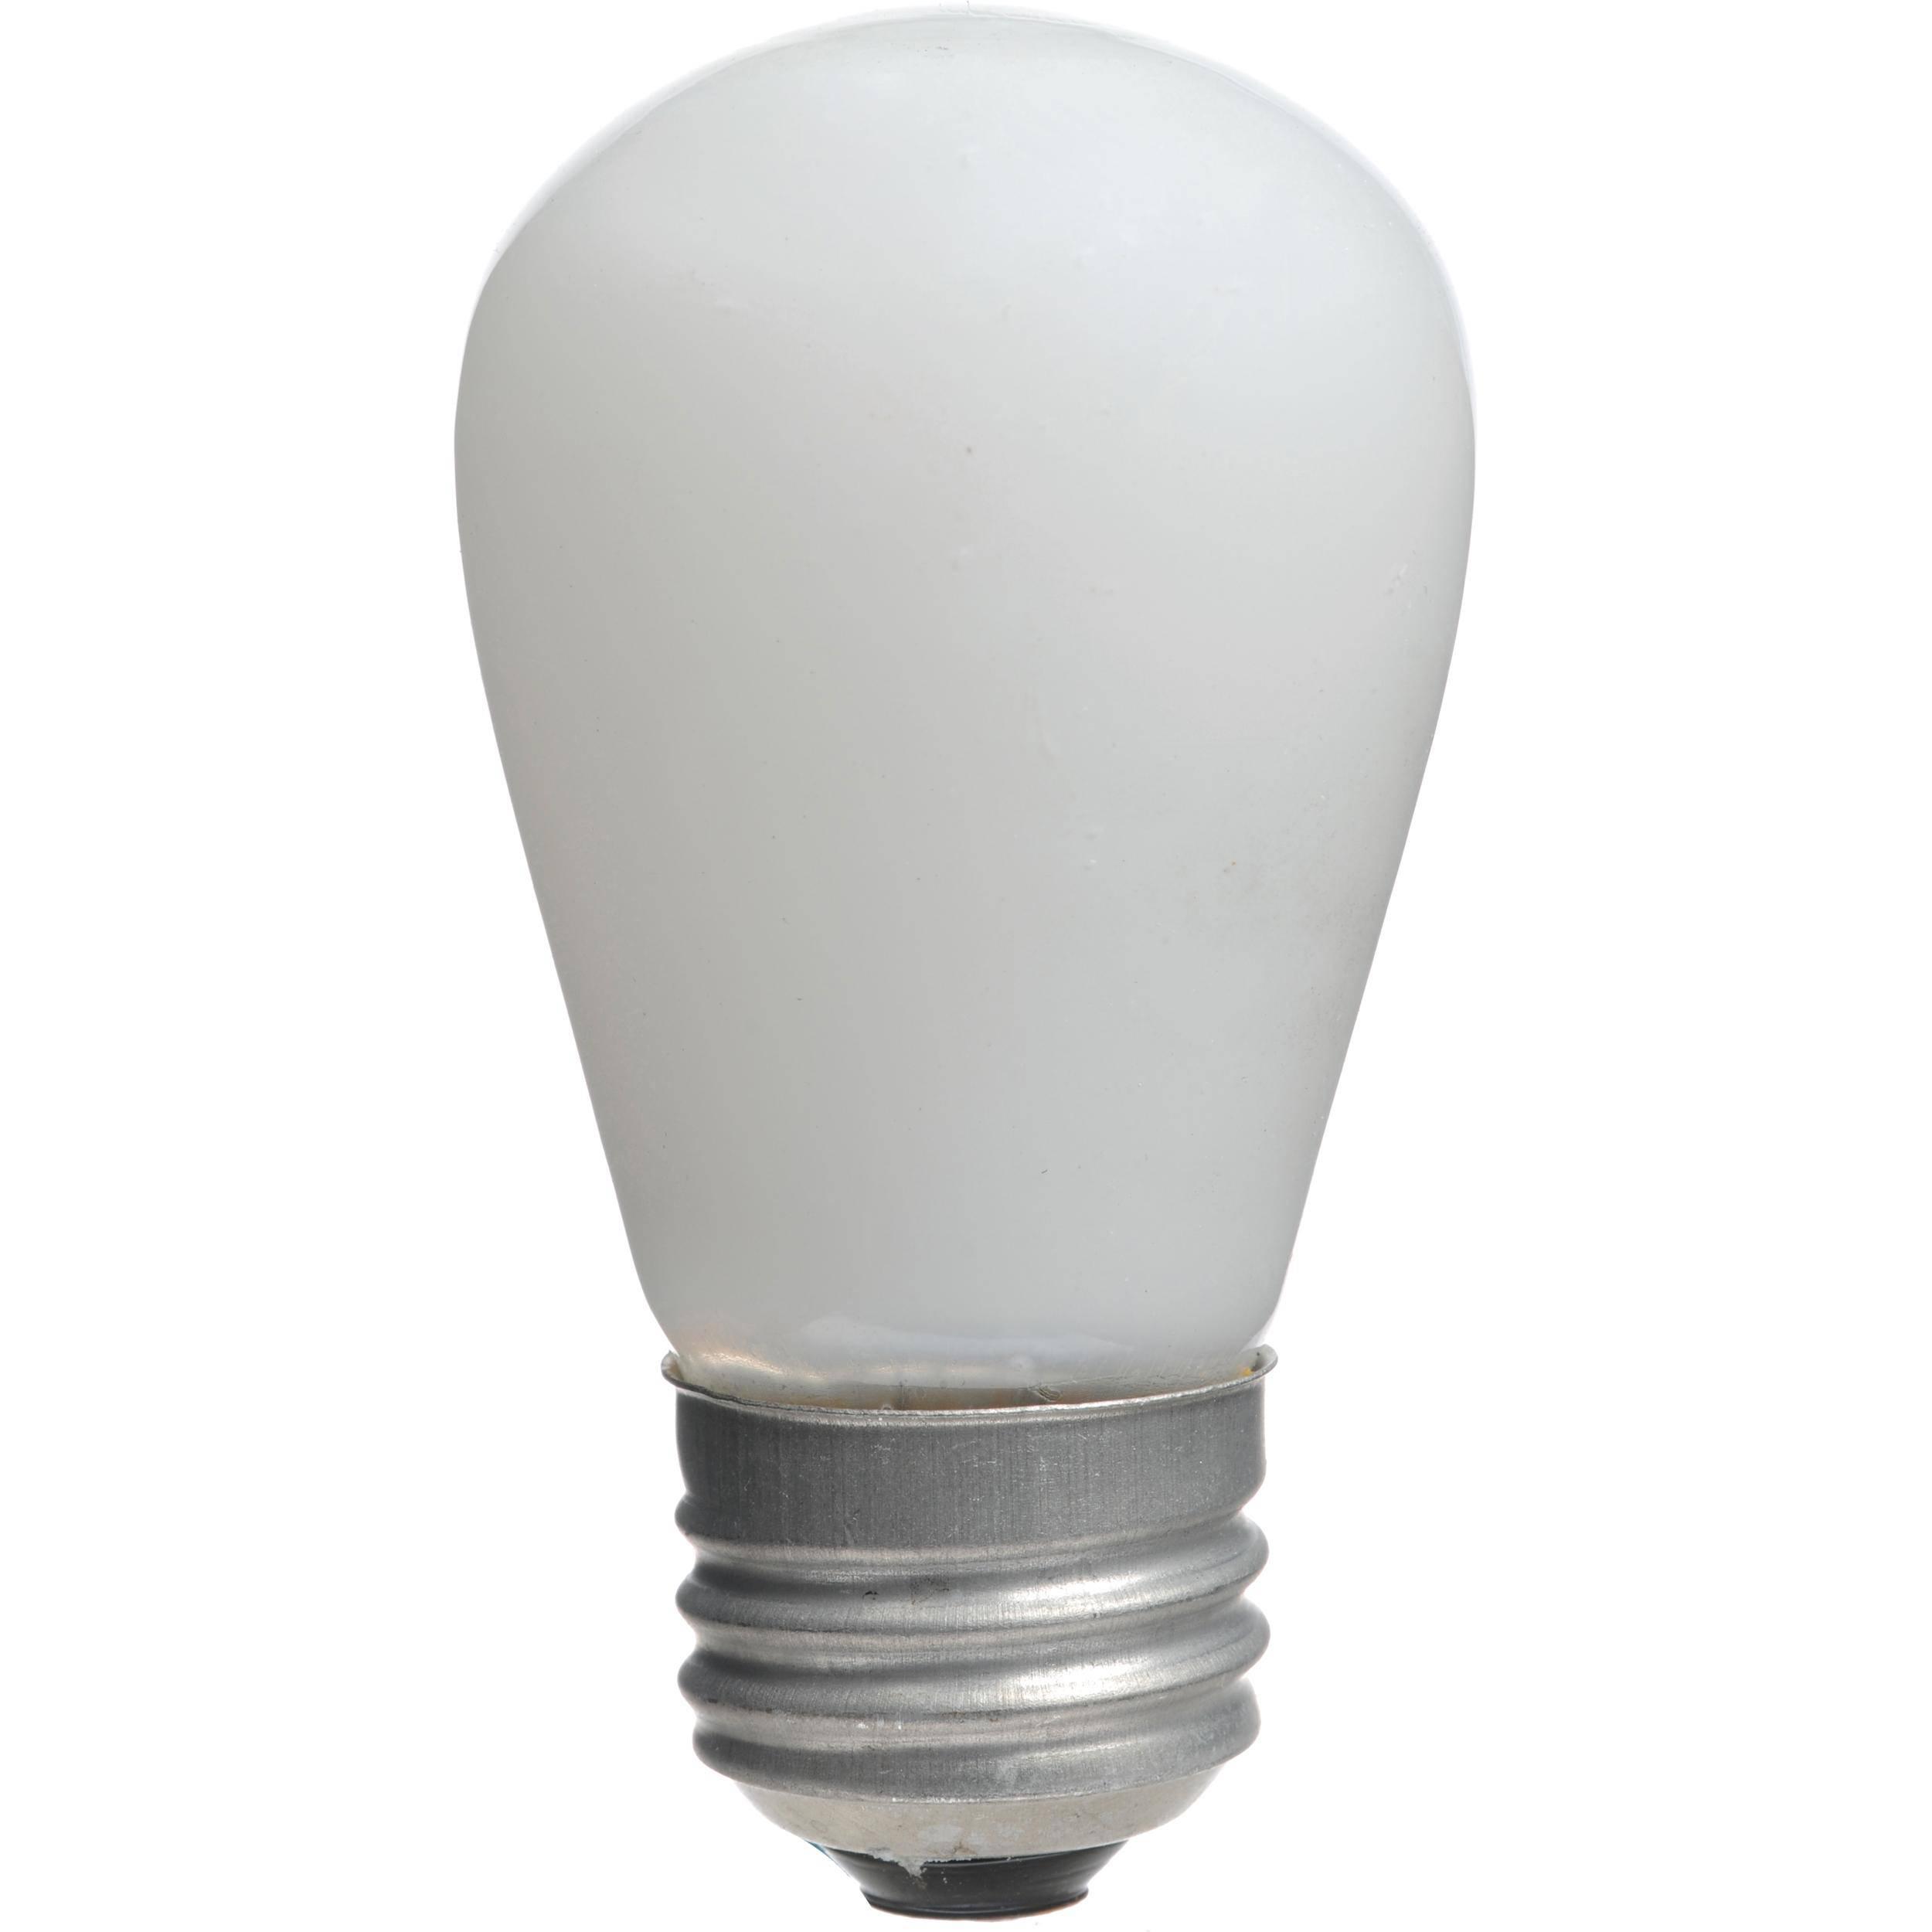 Sylvania Osram 140 75w 120v Lamp 11625 B H Photo Video